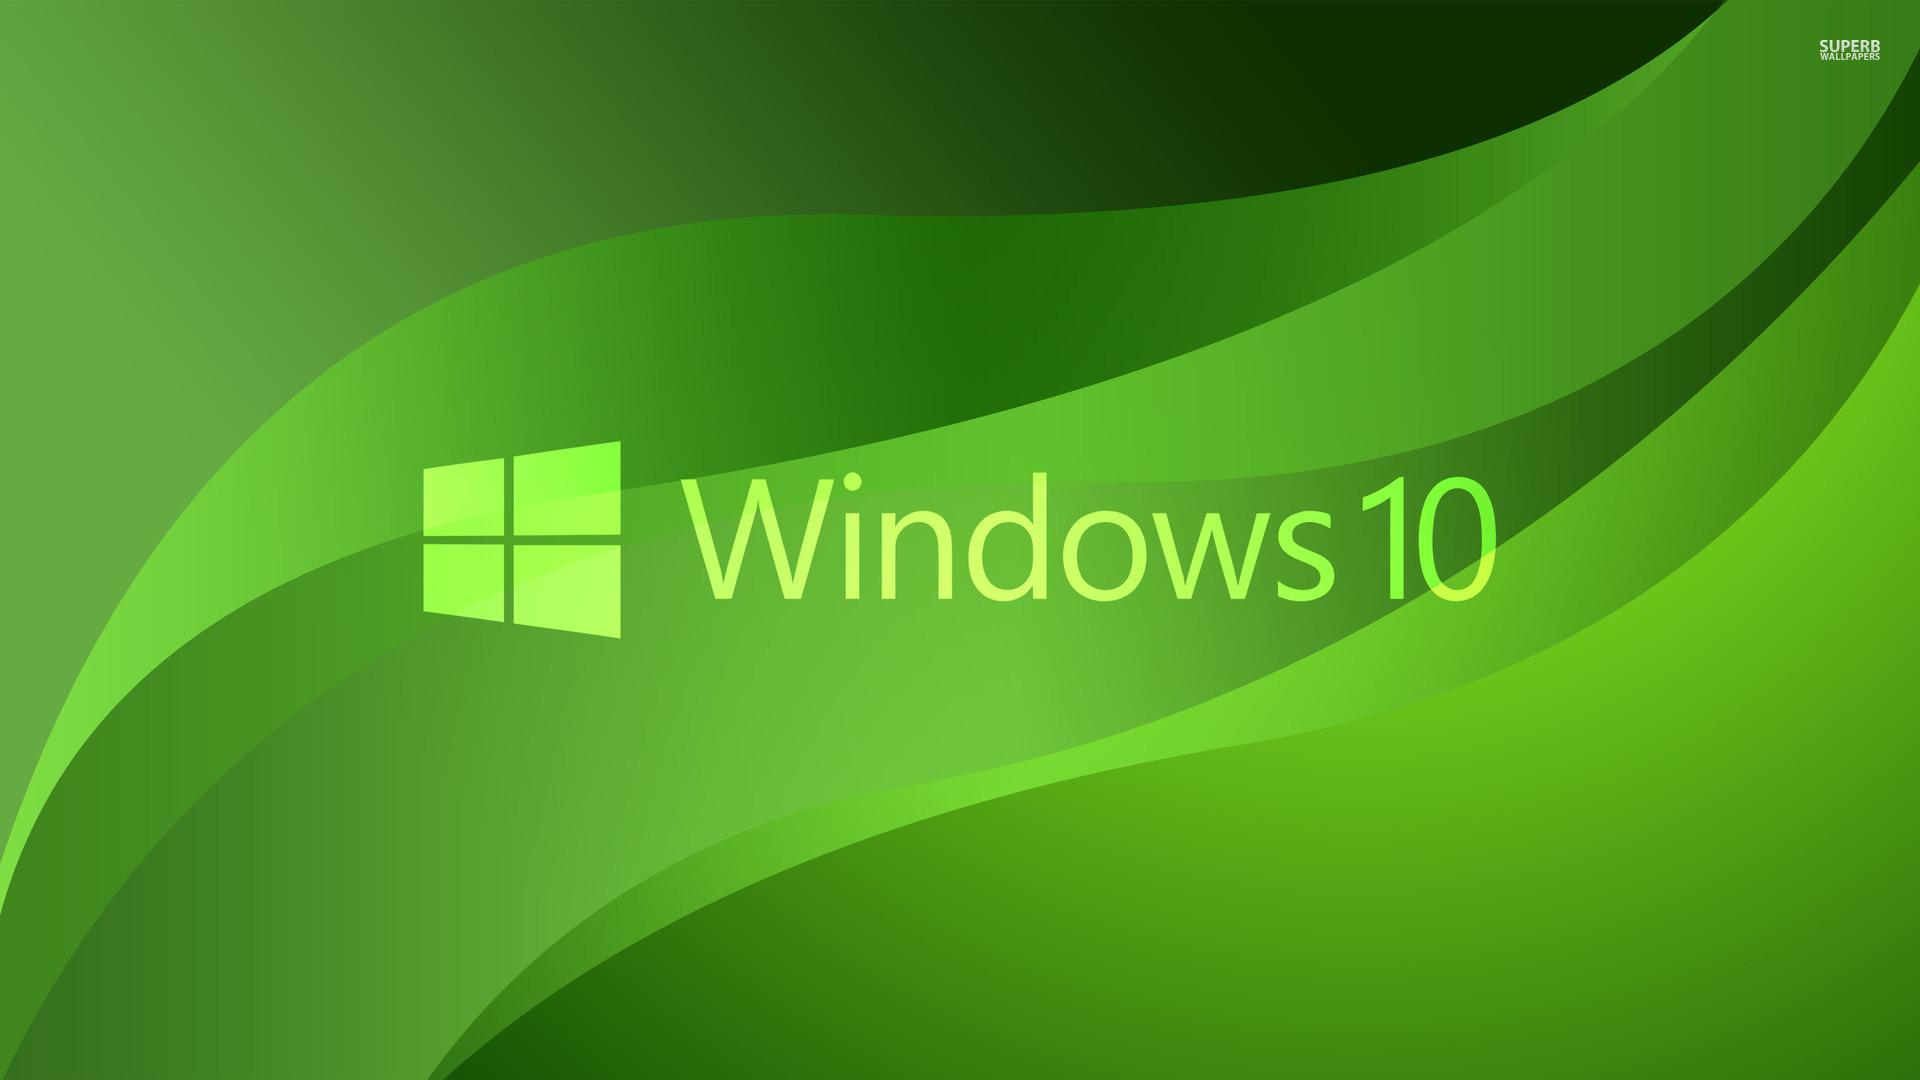 Windows 10 Wallpaper Hd Windows 10 Desktop Background